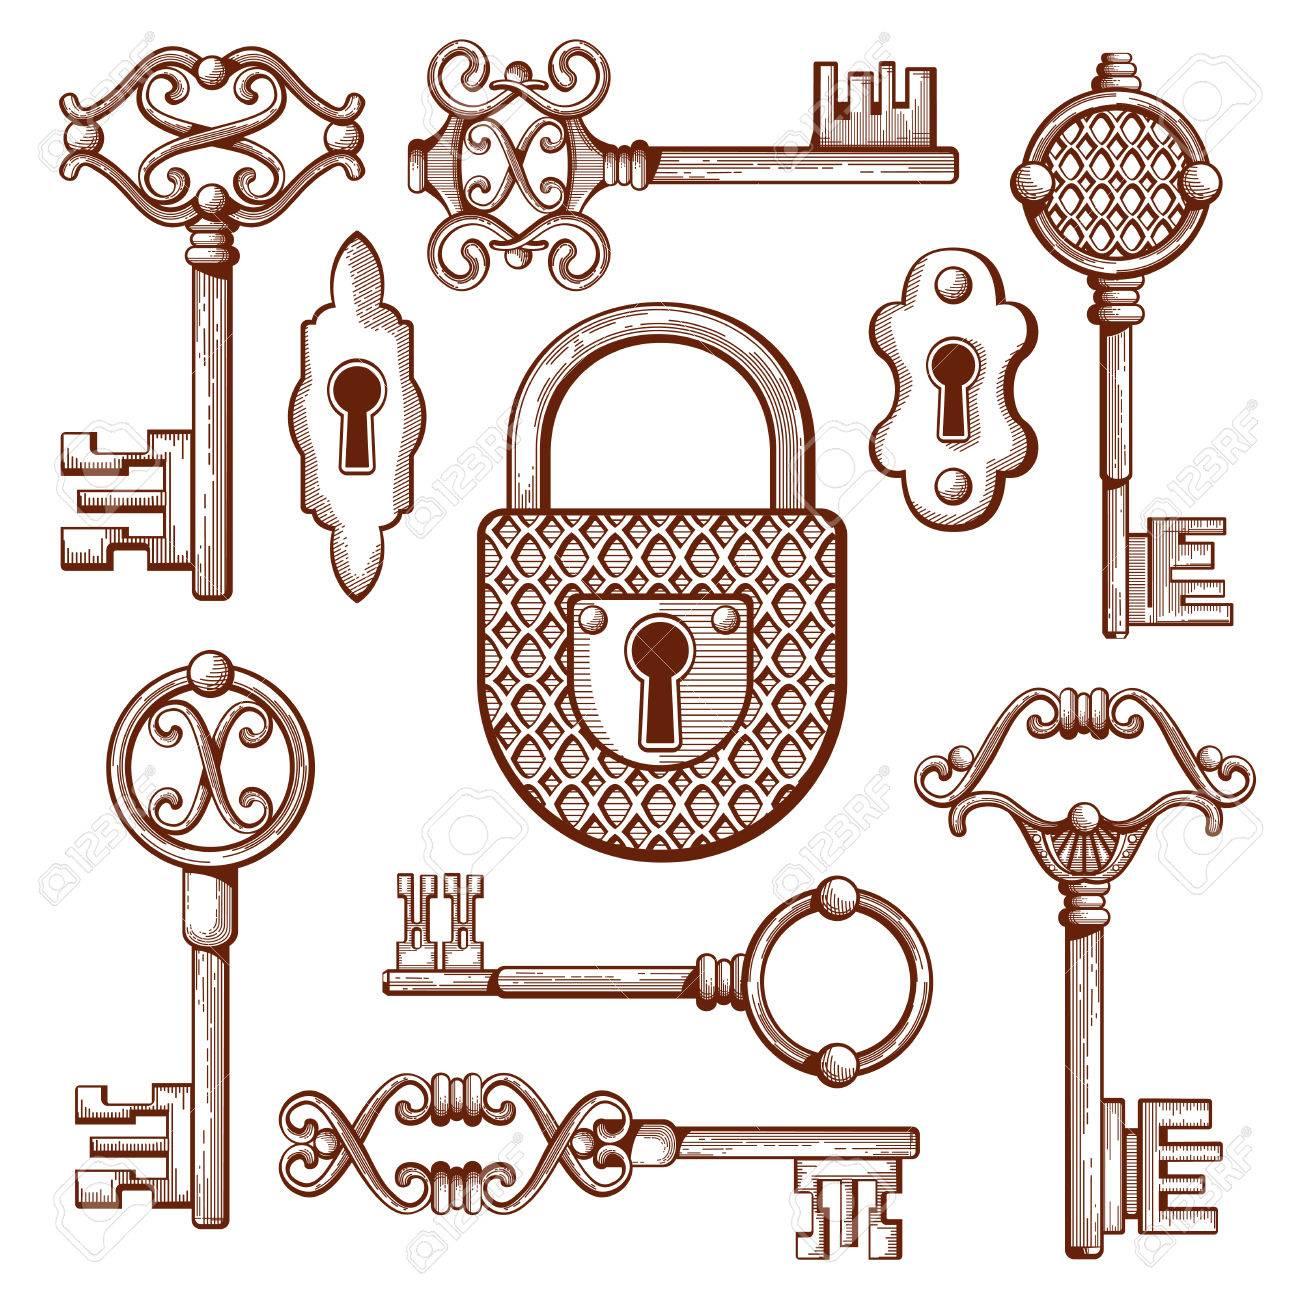 Vintage keys, locks and padlocks hand drawn. Keyhole and secrecy, various classic elements, vector illustration - 61707831